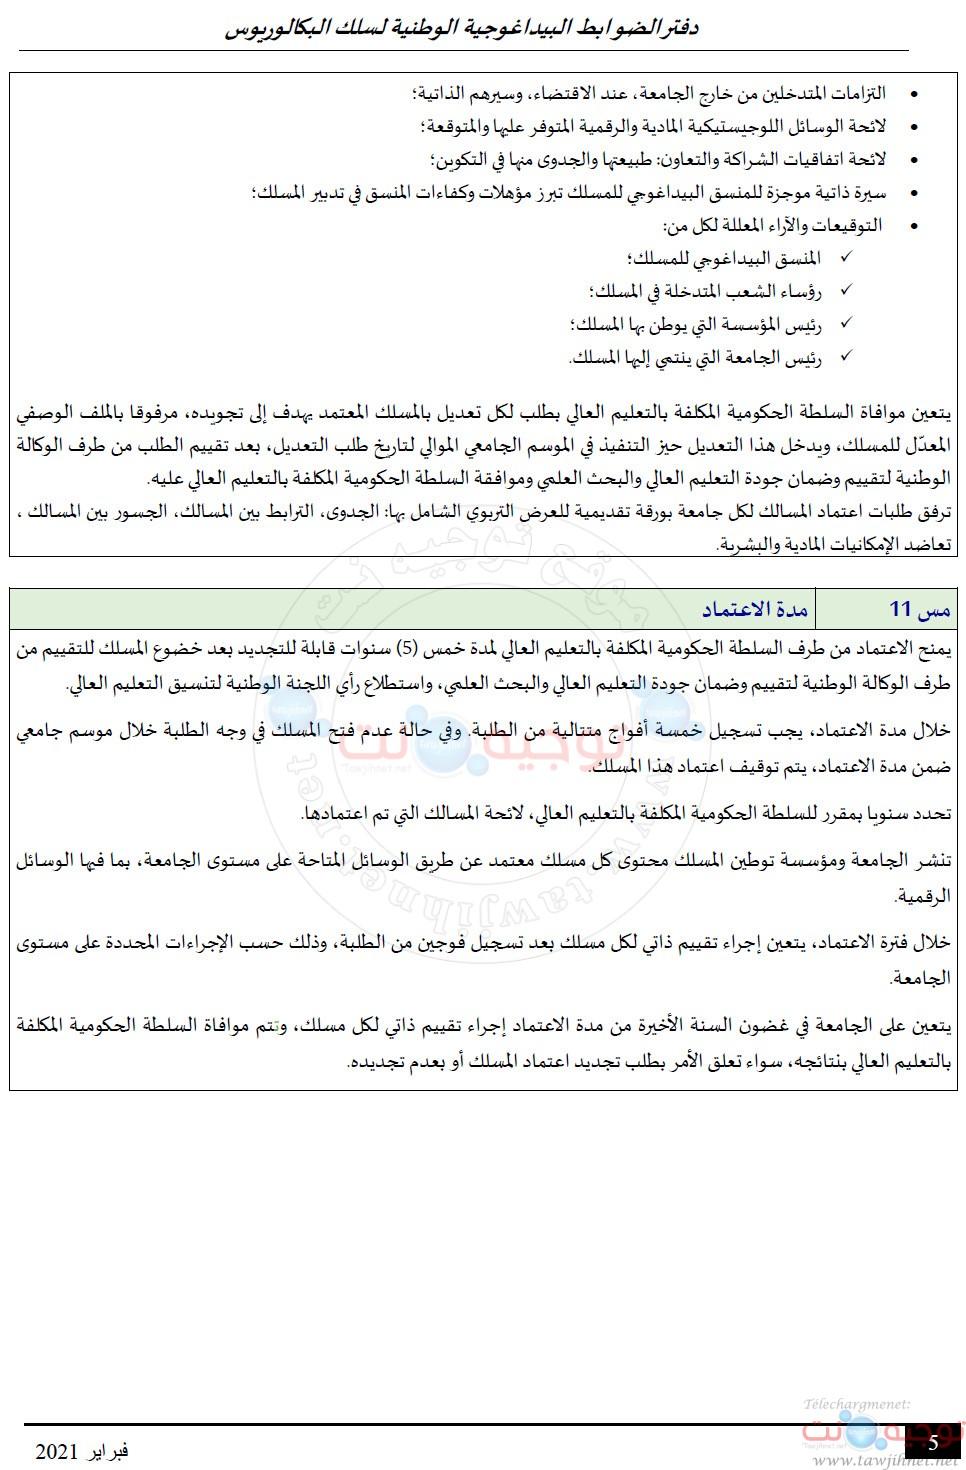 Bachelor-CNPN-normes-pedagoqiques-2021_Page_05.jpg